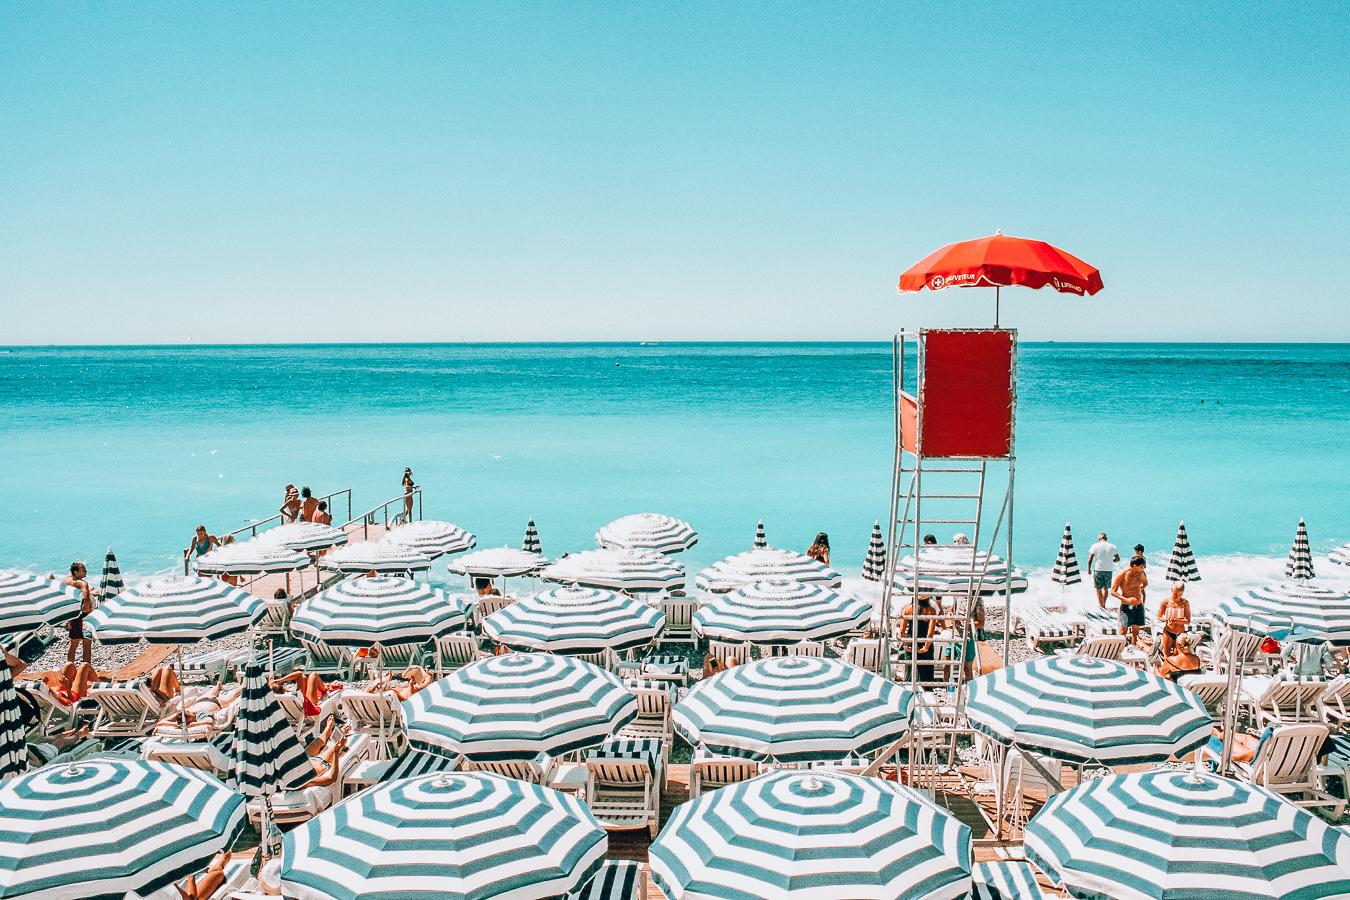 Beach with umbrellas